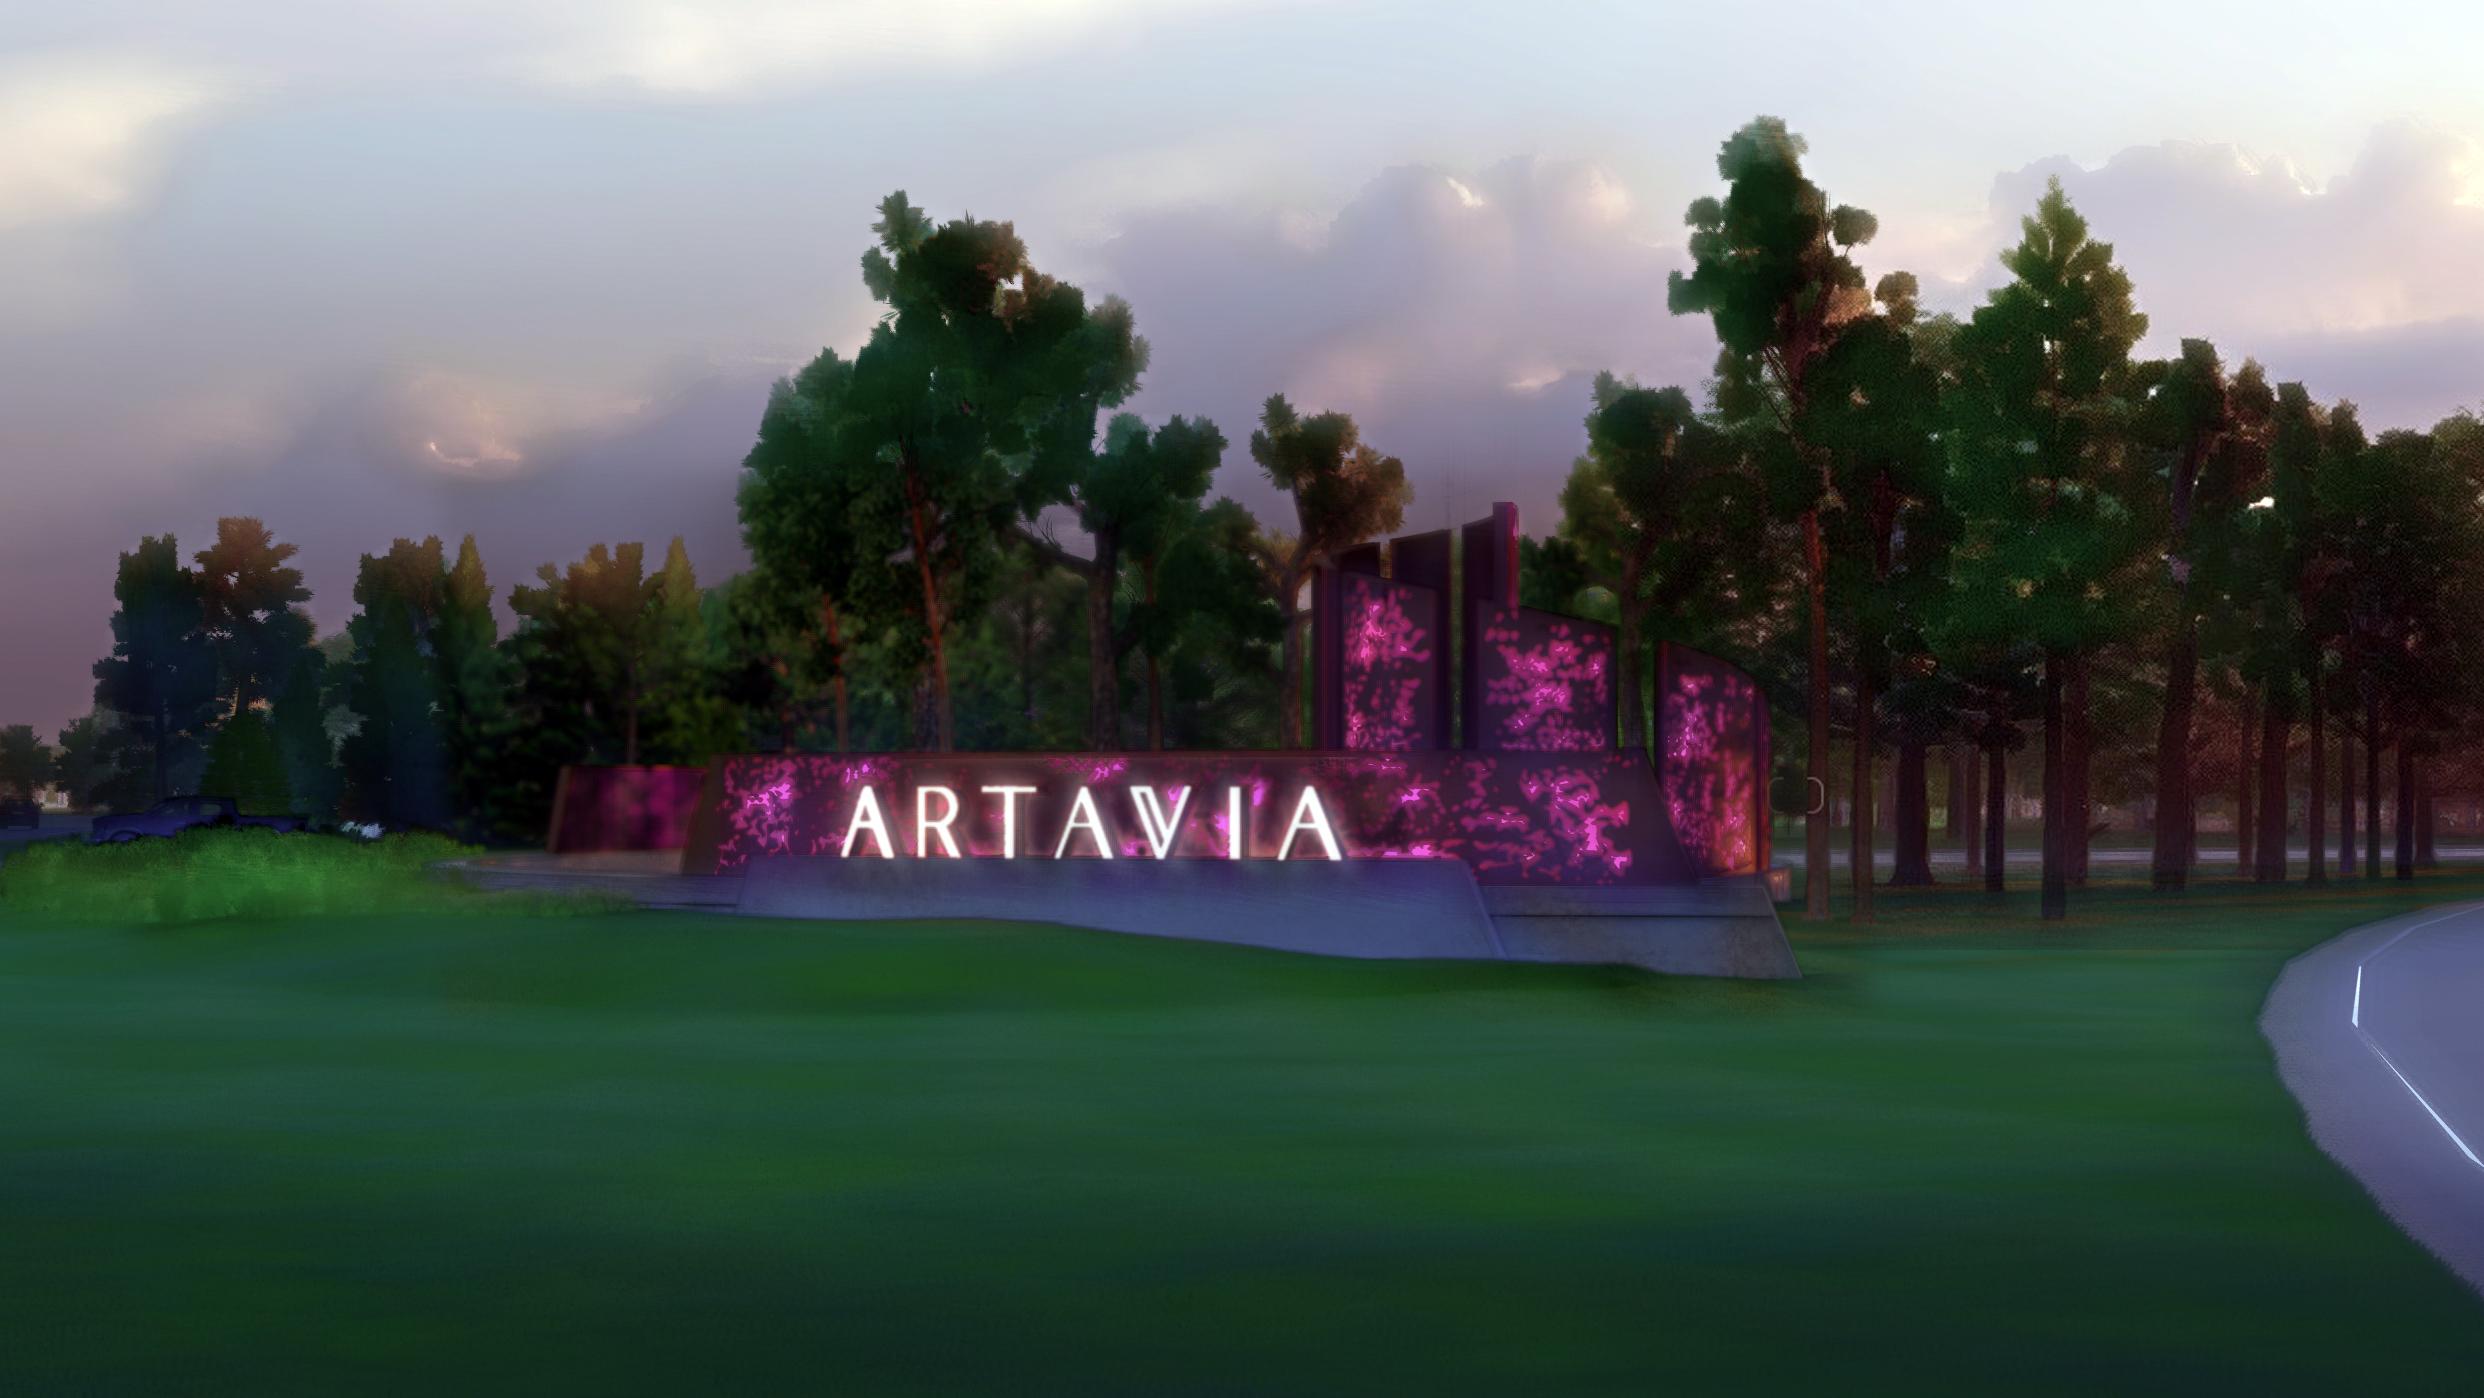 Artavia Entry Primary Entrance Monumentation  TBG Partners - Conroe, TX  Design team member on entry monument for Artavia community.